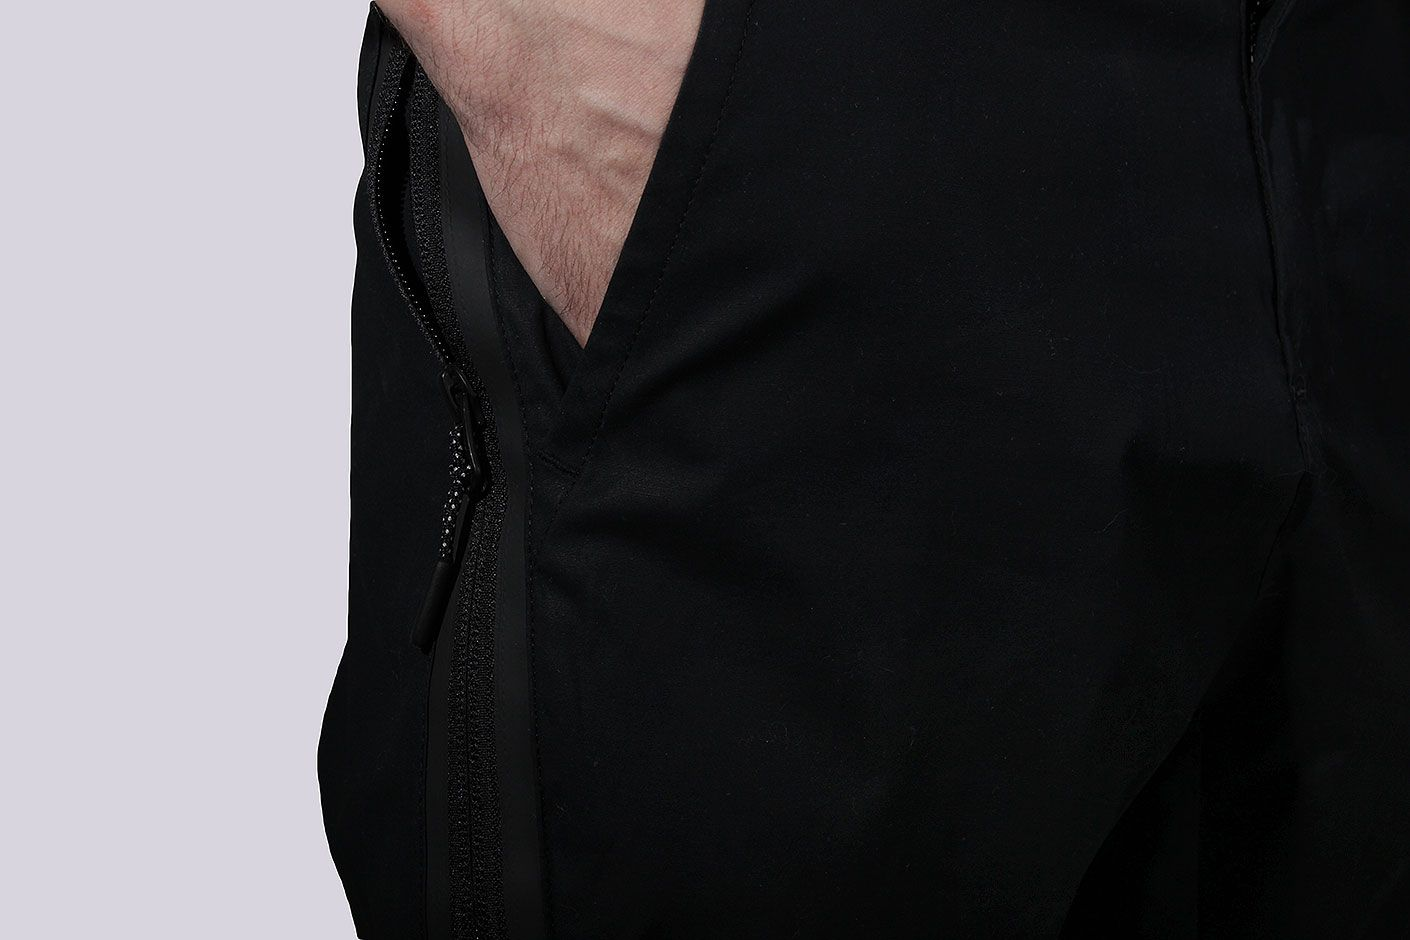 9384d3c59cda Чёрные мужские брюки Bonded Jogger Pants от Nike (823363-010) по ...